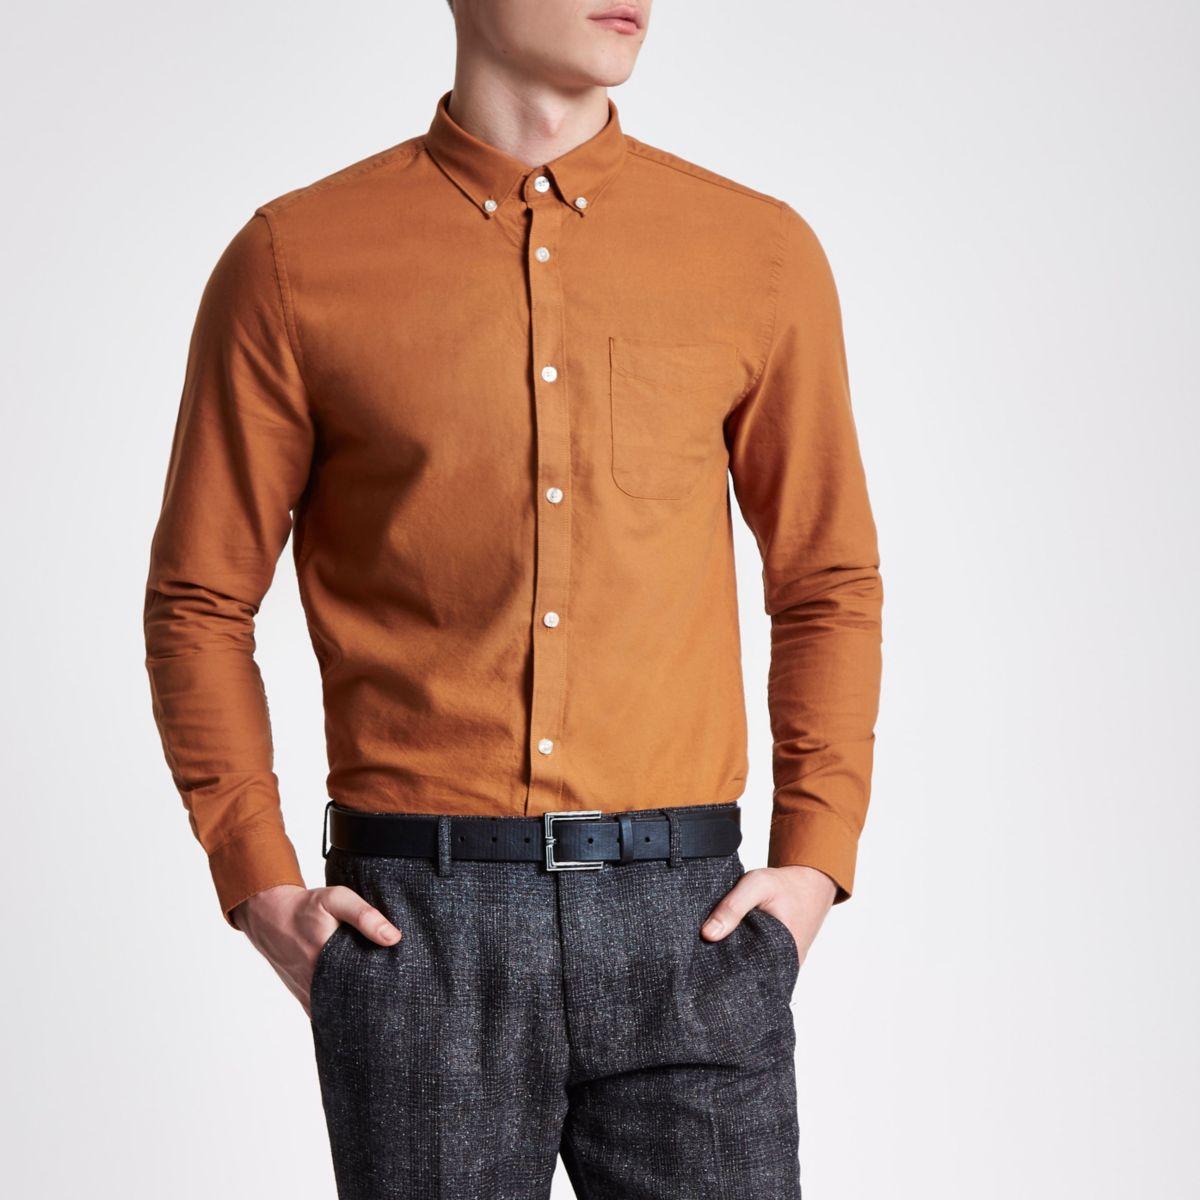 Rust orange button-down Oxford shirt